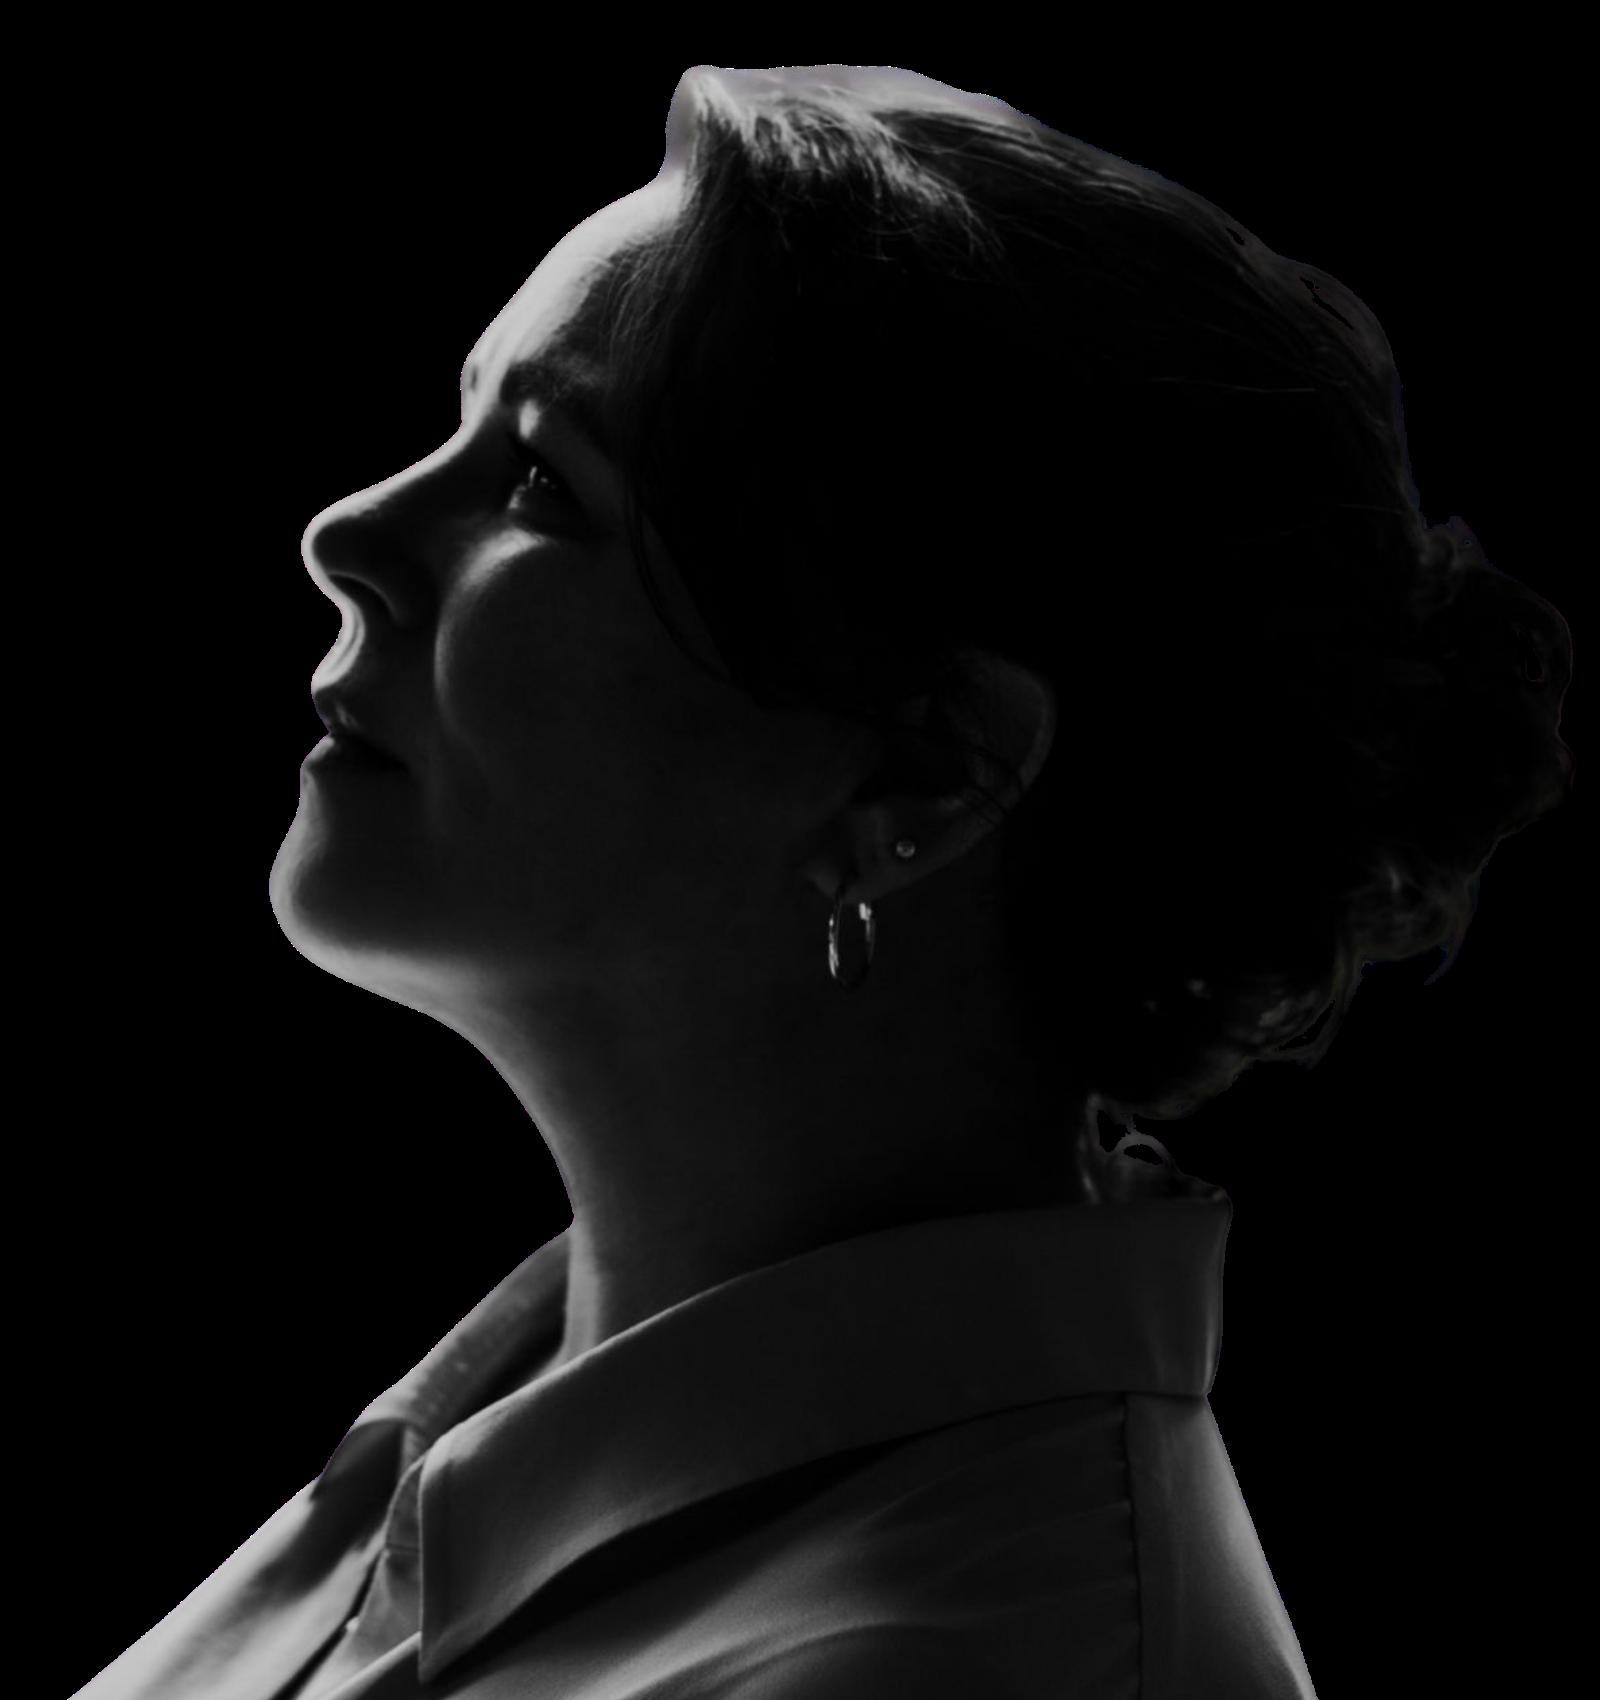 Silhouette origineel Judith Fanto schrijver auteur spreker 1600x1700 px transpa